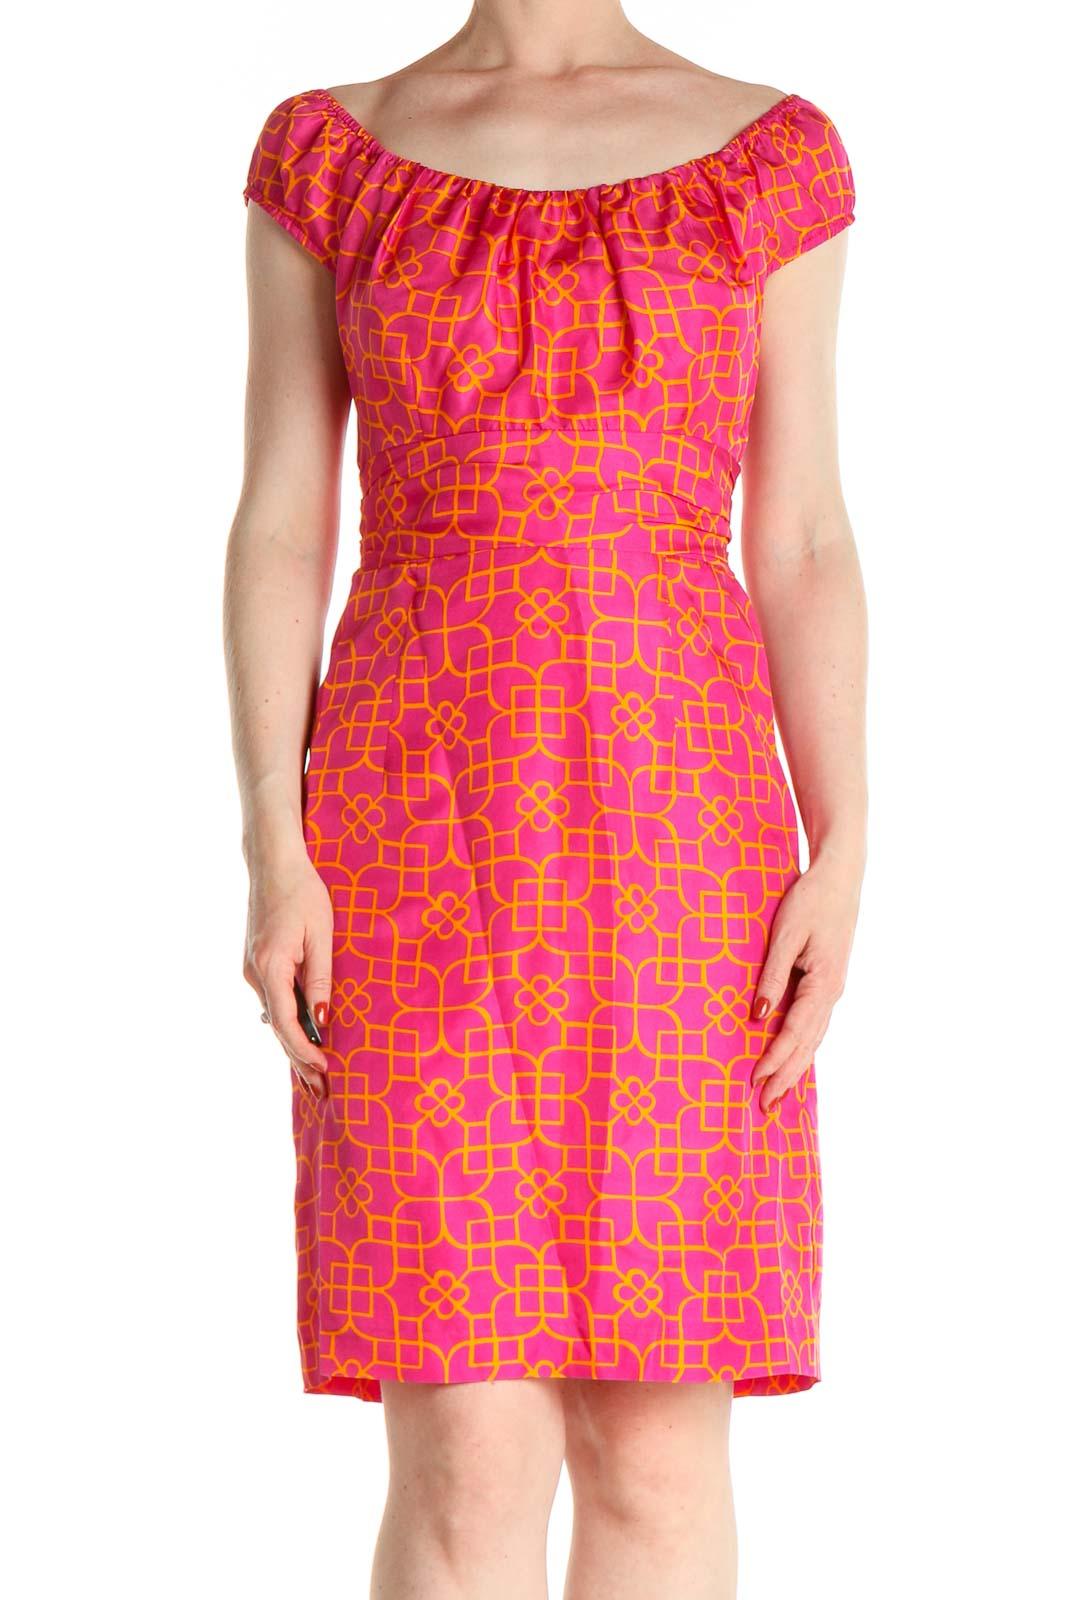 Pink Geometric Print Retro Sheath Dress Front